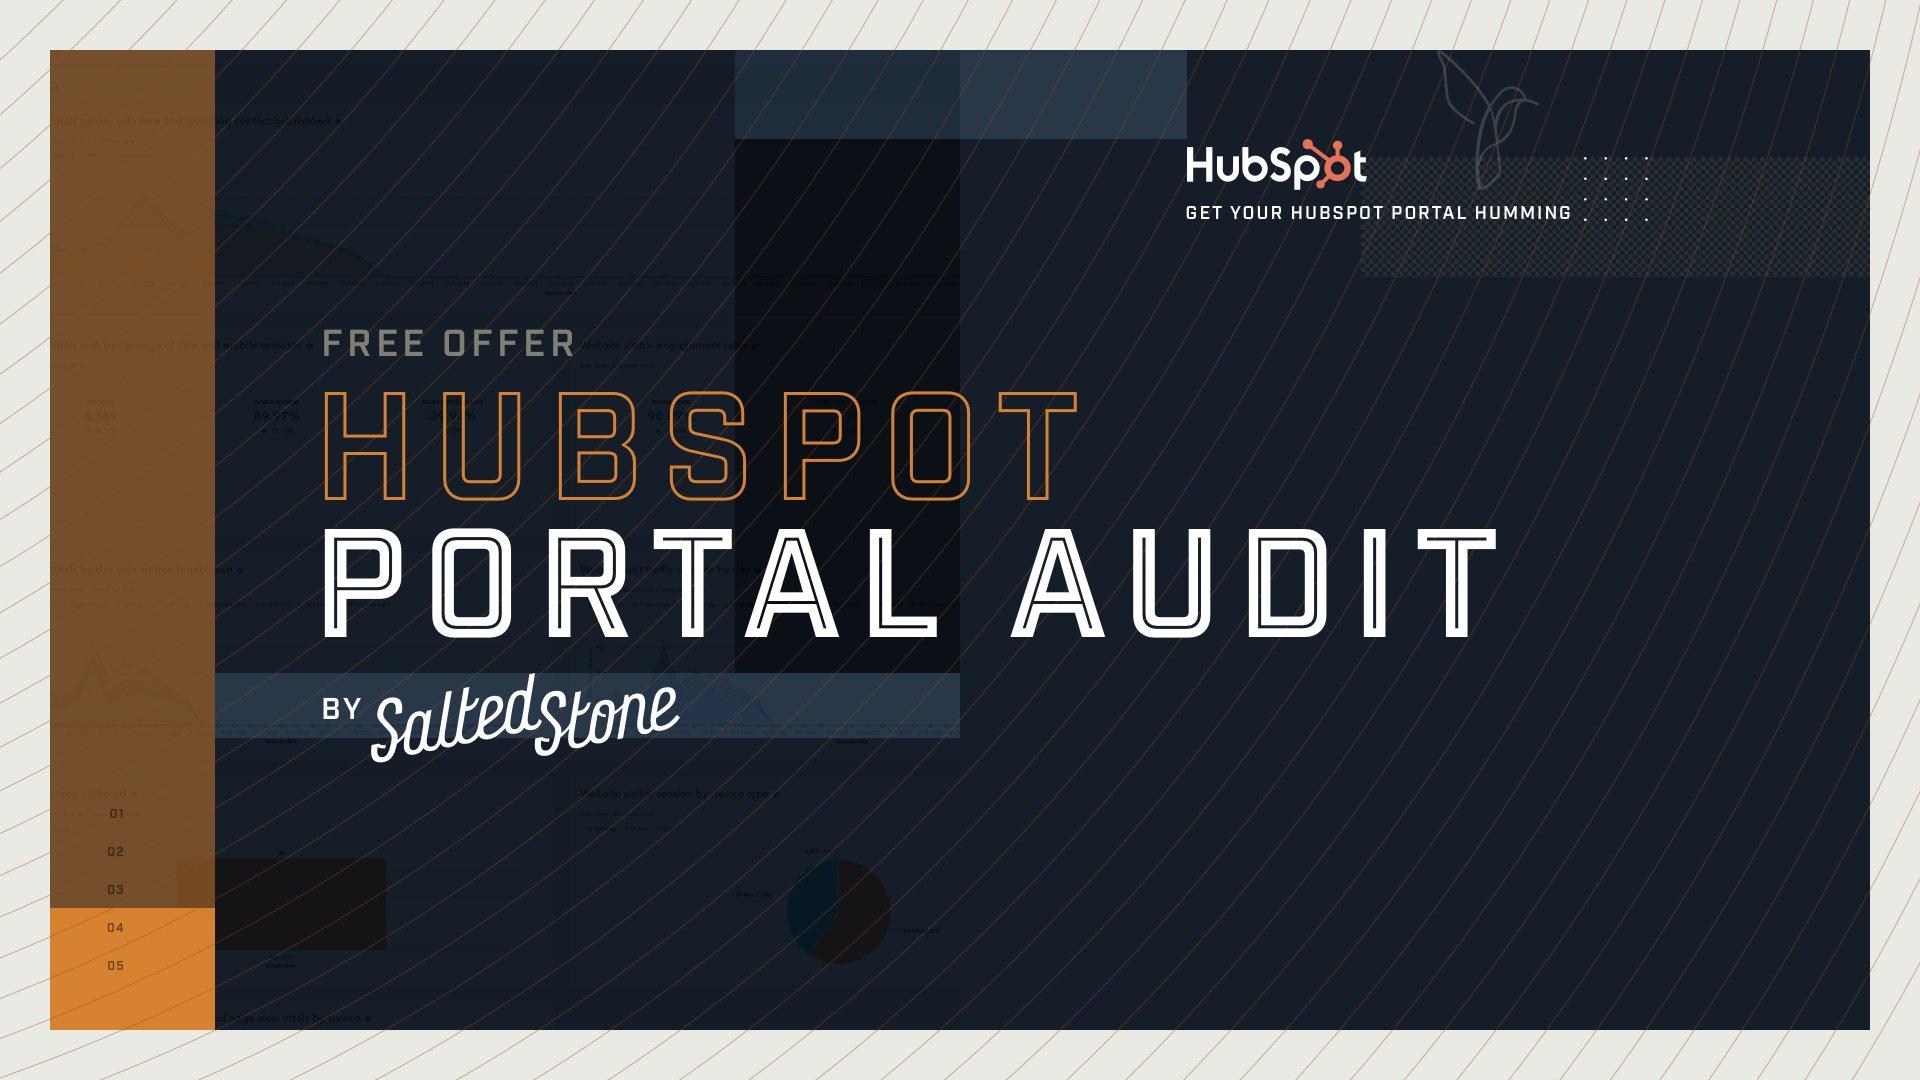 Free Offer HubSpot Portal Audit